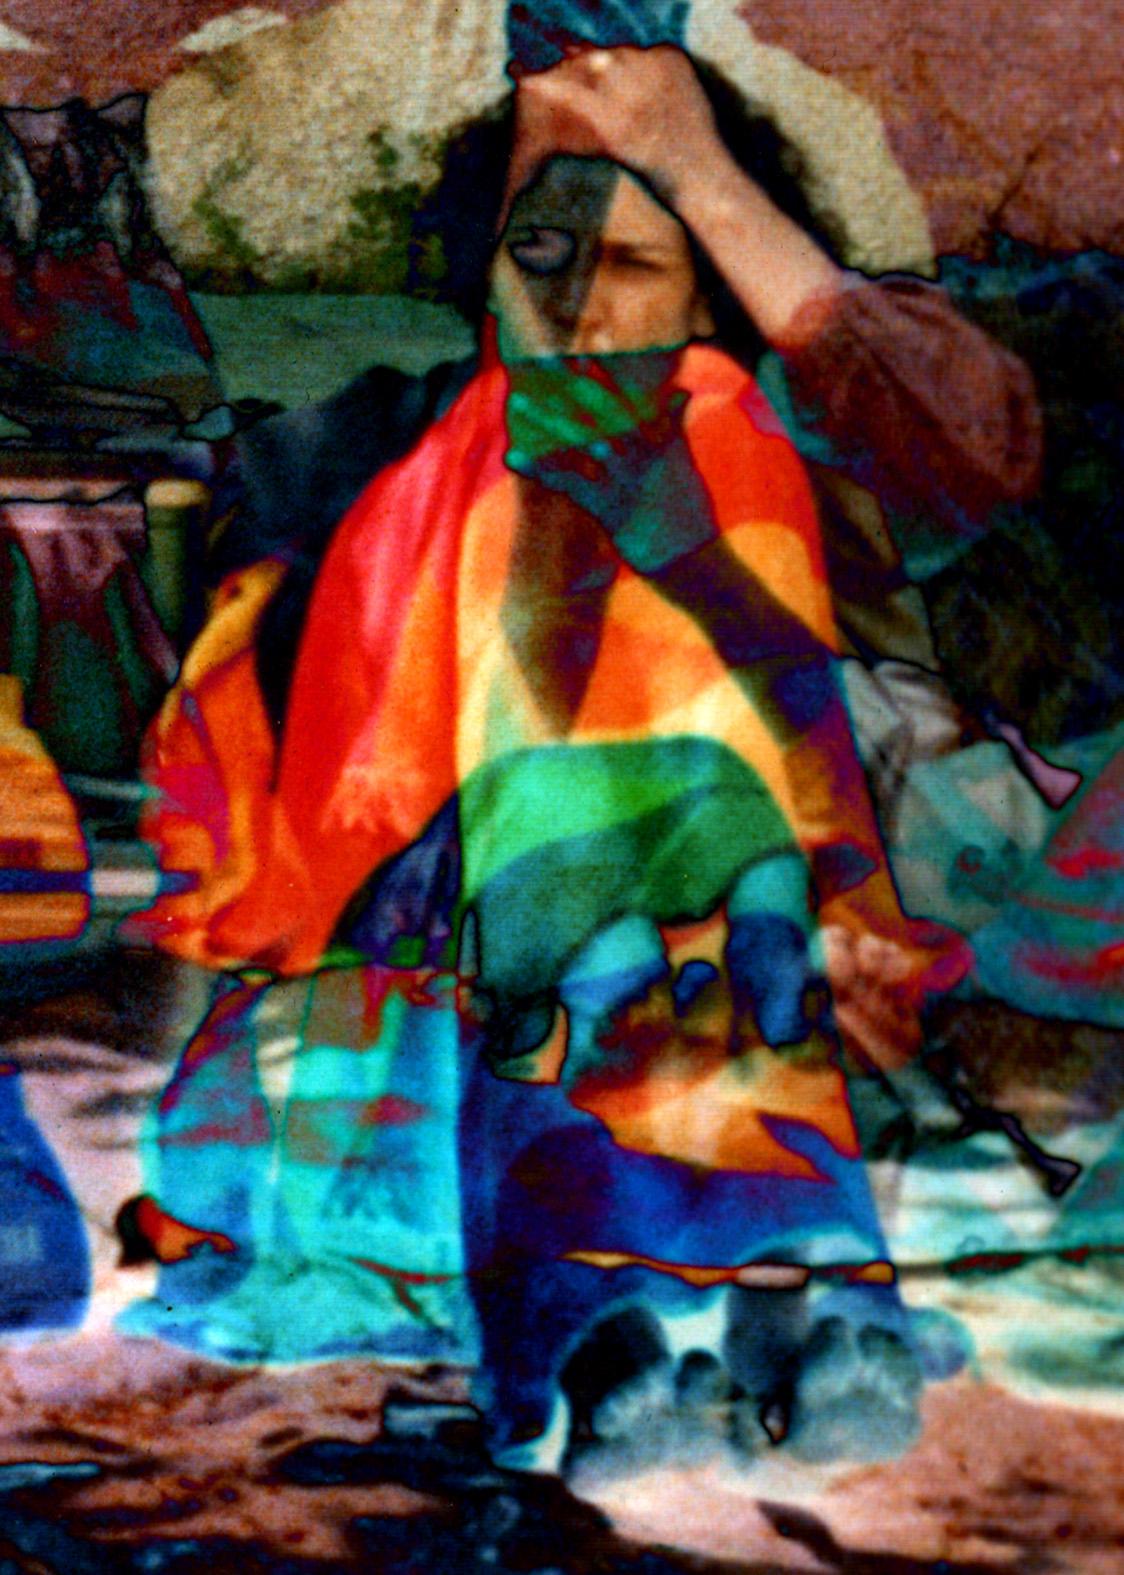 Spectral Days, C-print, 63 x 45 cm, 2013.